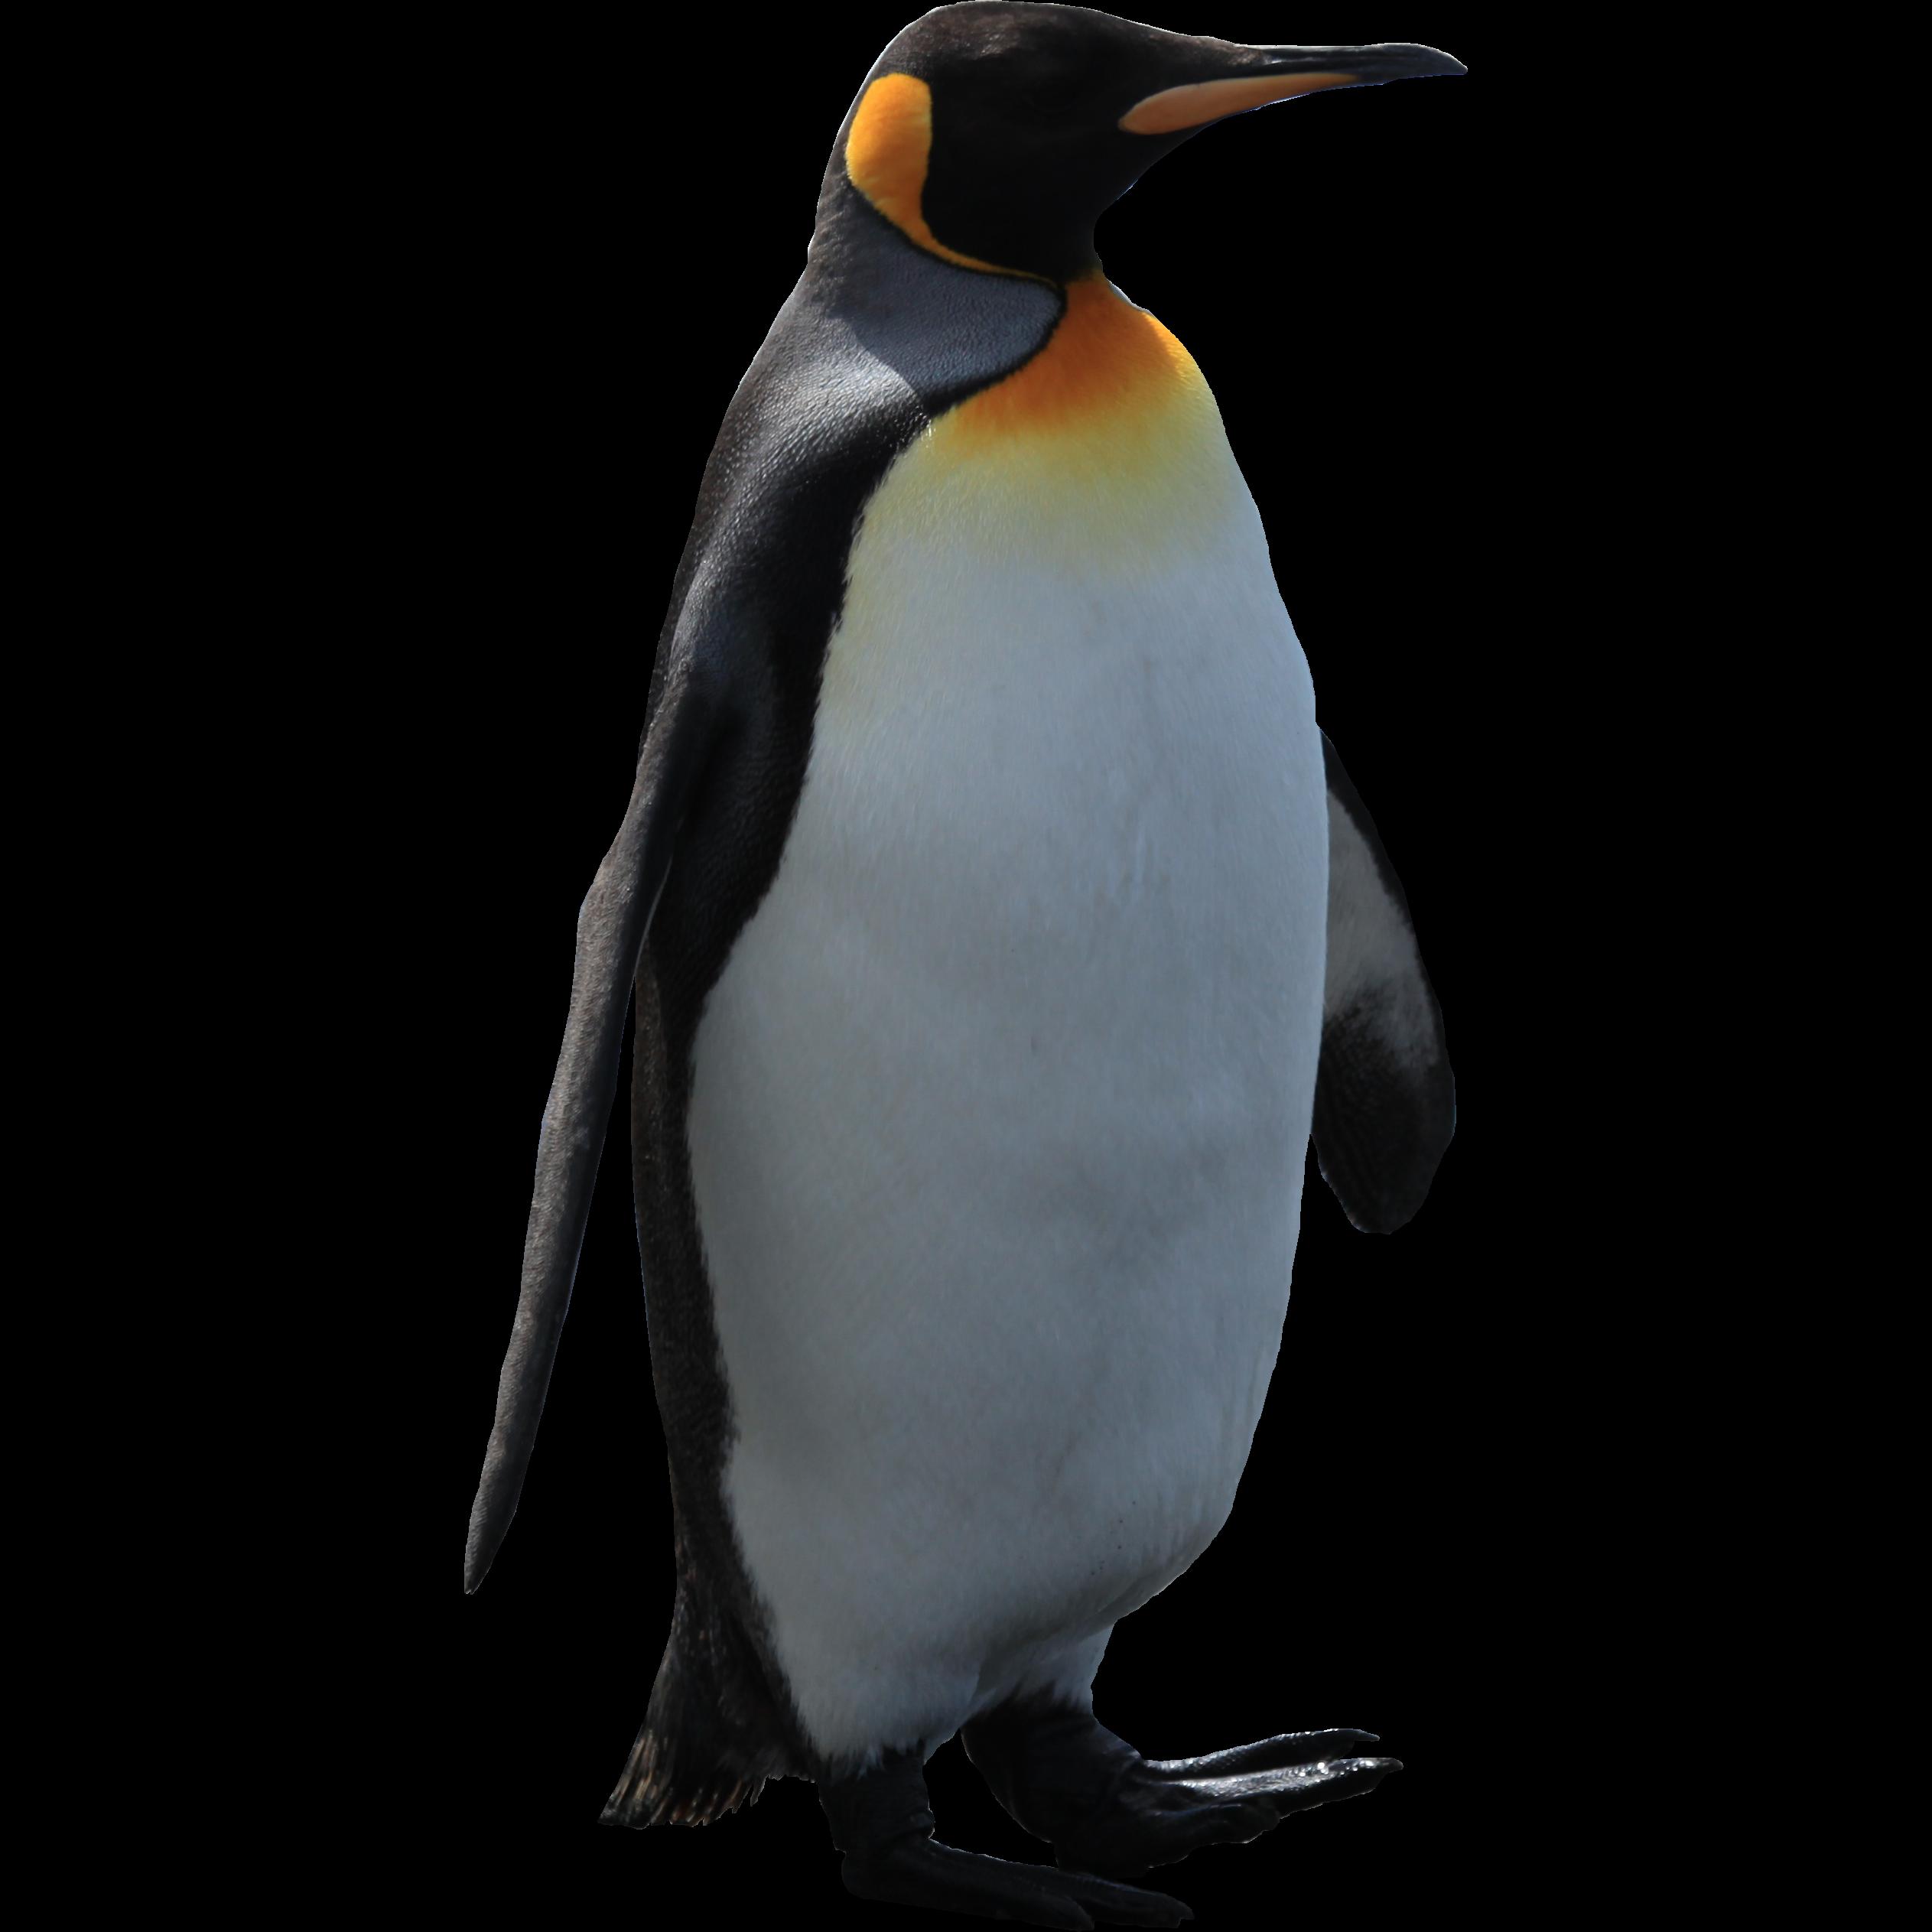 Penguins Penguin Images Animals Images